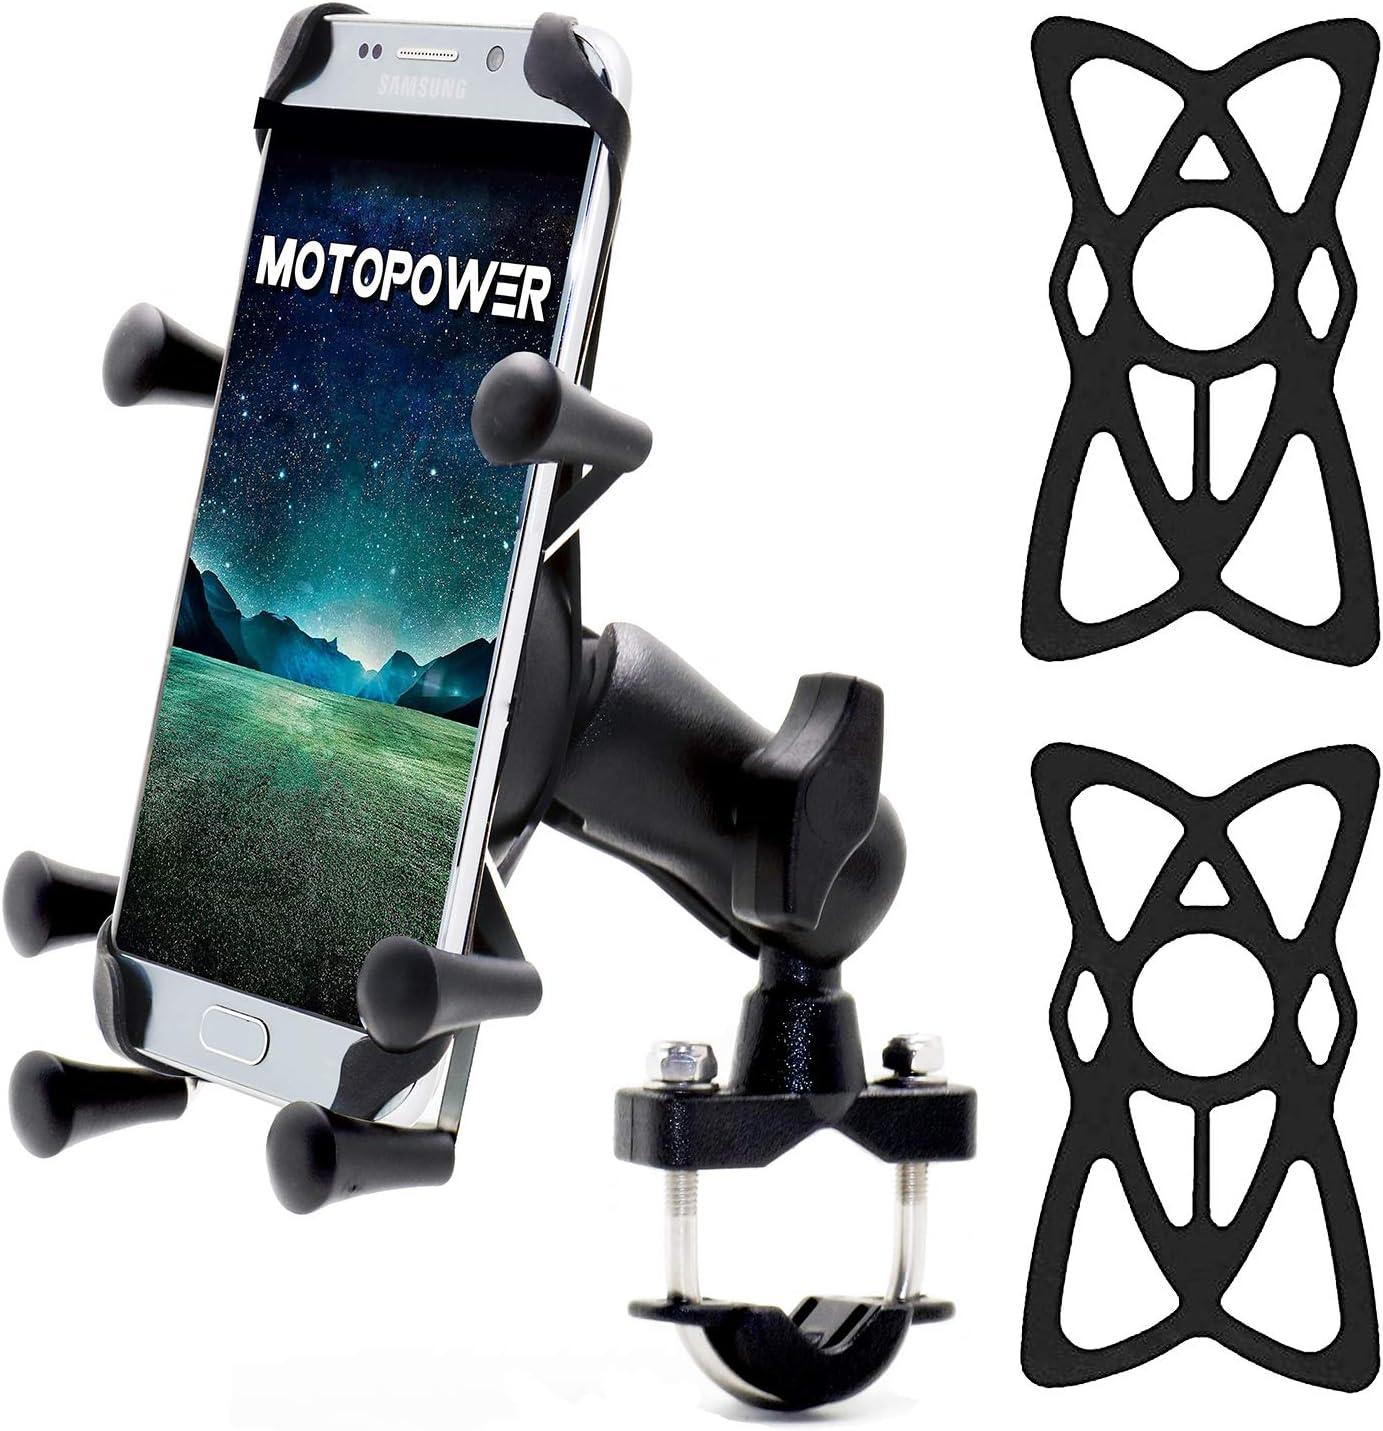 Motopower Mp0619 Fahrrad Motorrad Handy Halterung Für Jedes Smartphone Gps Universal Mountain Road Fahrrad Motorrad Lenkerhalter Auto